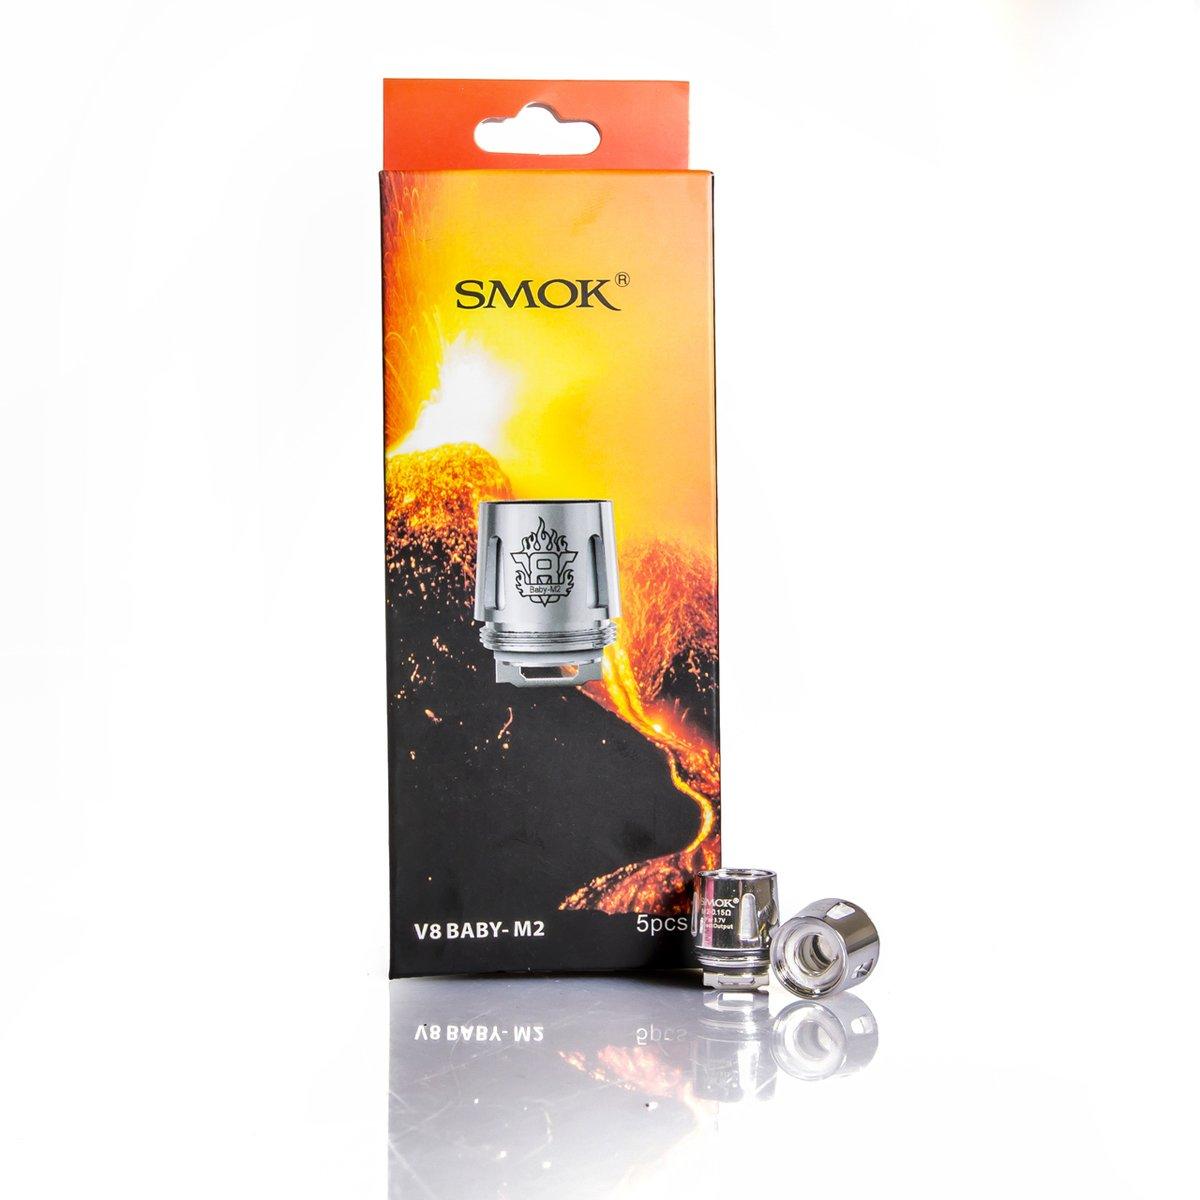 Smok TFV8 Baby Beast Coils - 5 Pack